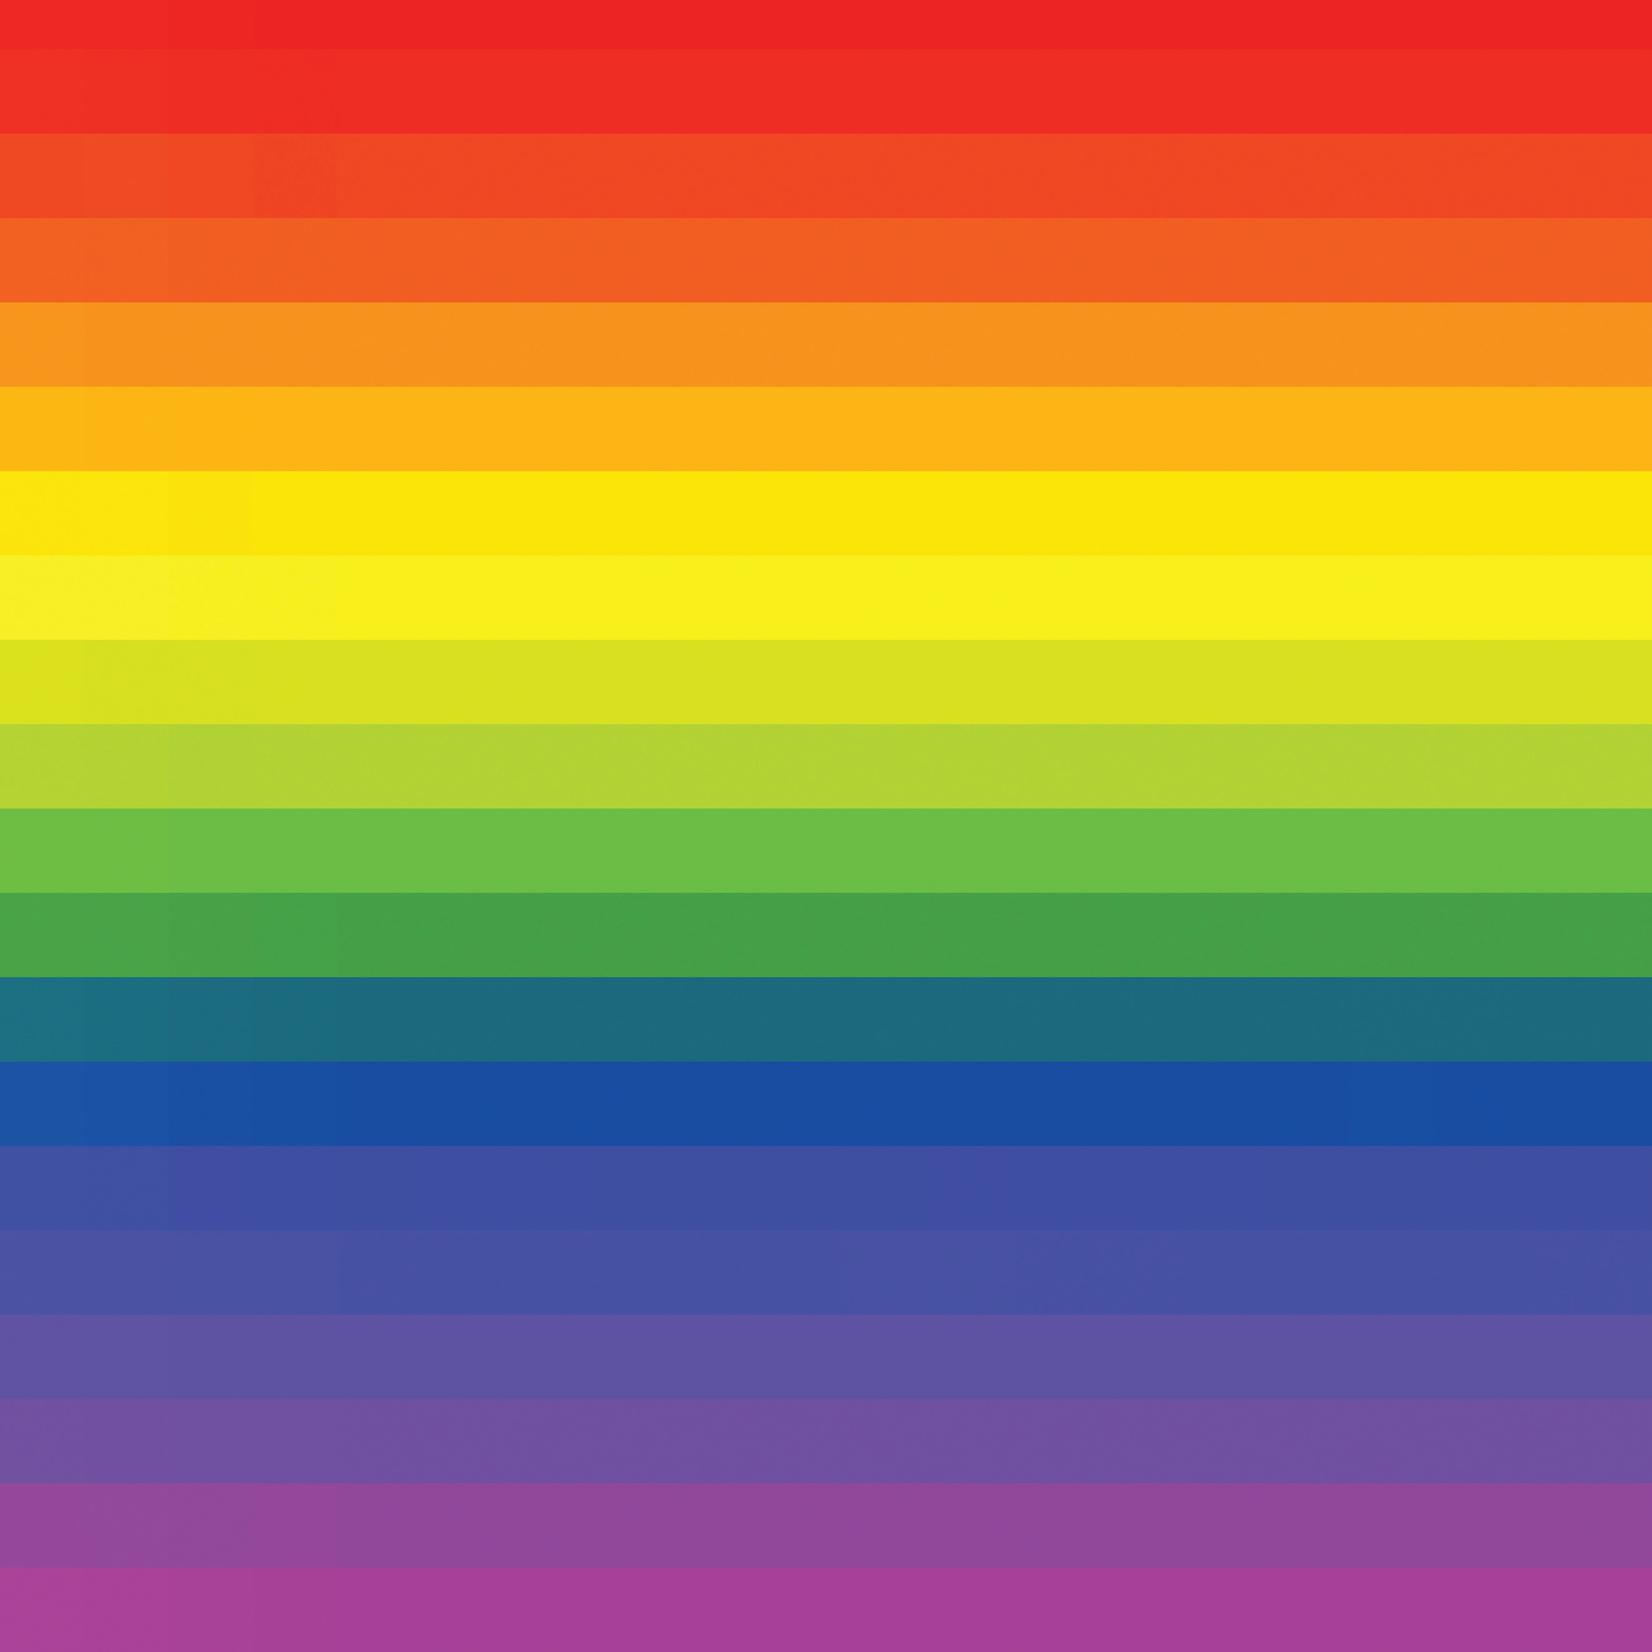 Rainbow Shades